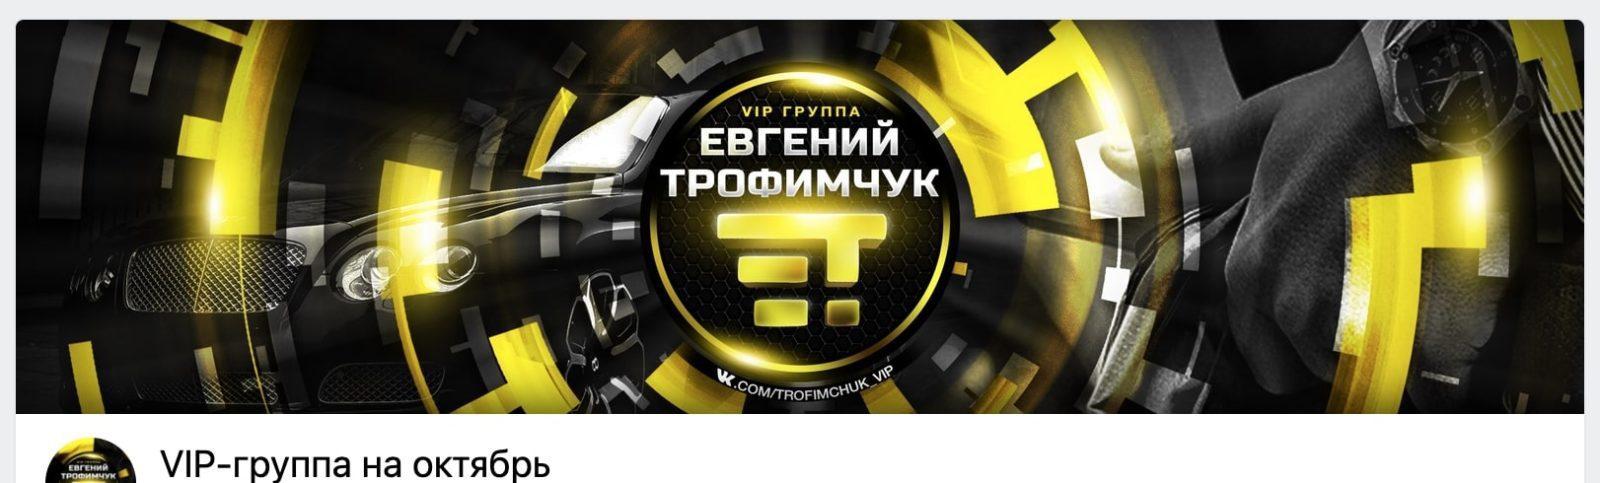 Группа ВК Евгения Трофимчука • LIVE